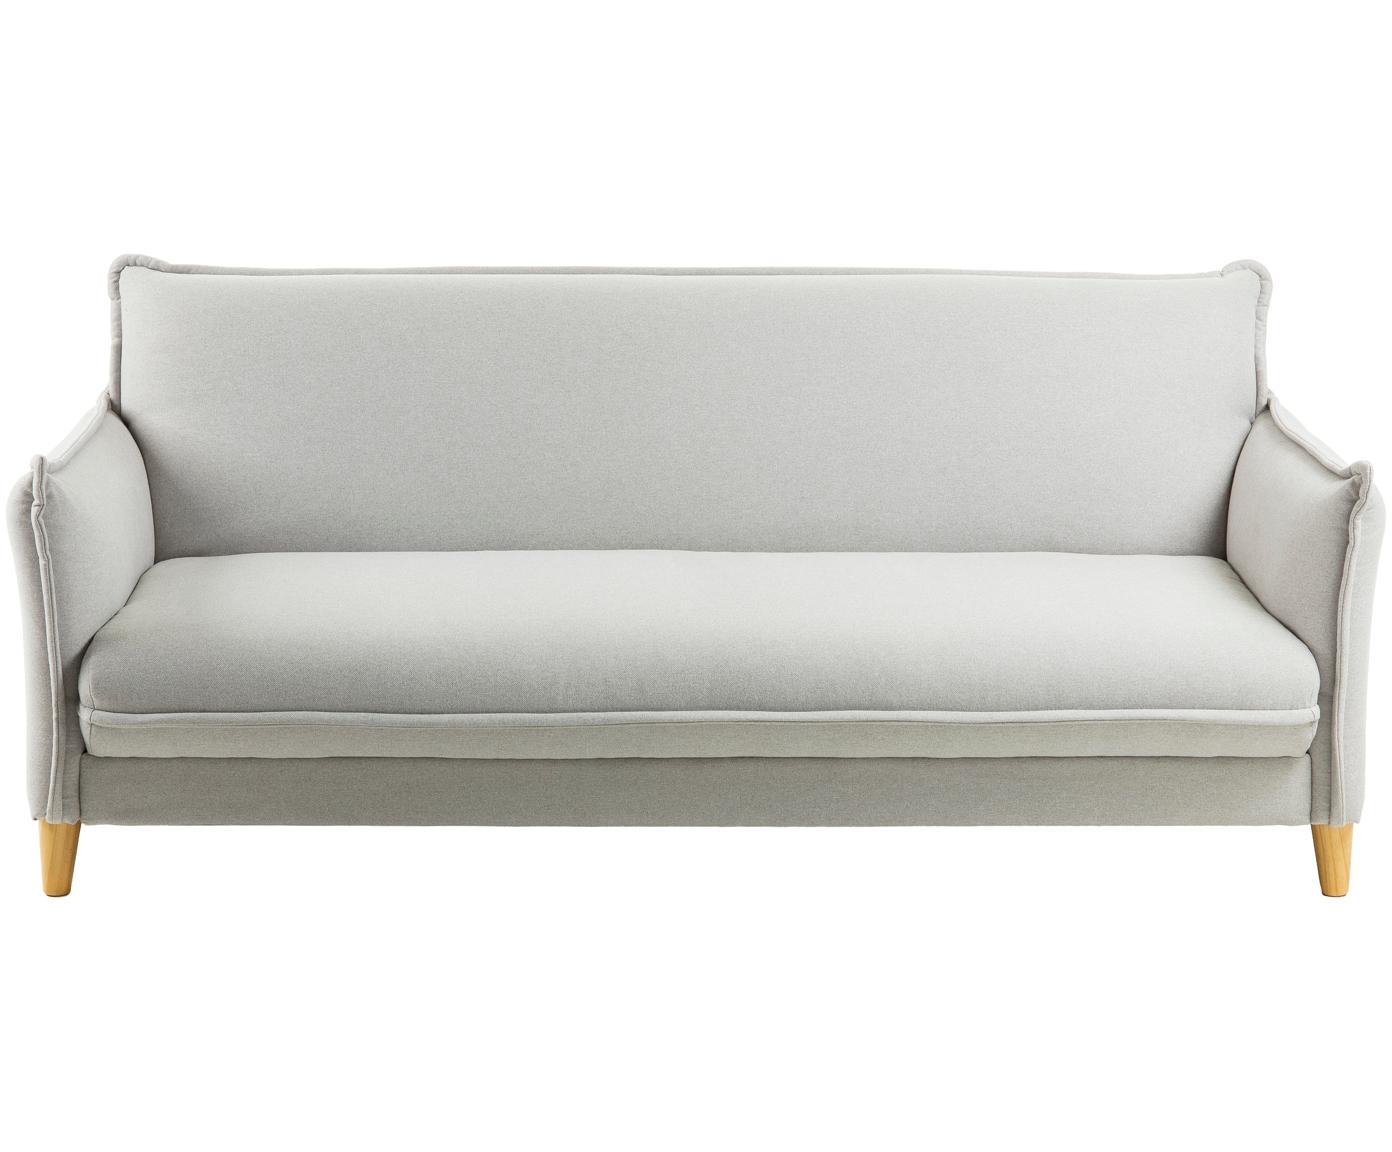 Schlafsofa Alizee (3-Sitzer), Bezug: Polyester 45.000 Scheuert, Füße: Buchenholz, massiv, natur, Webstoff Hellgrau, B 207 x T 93 cm